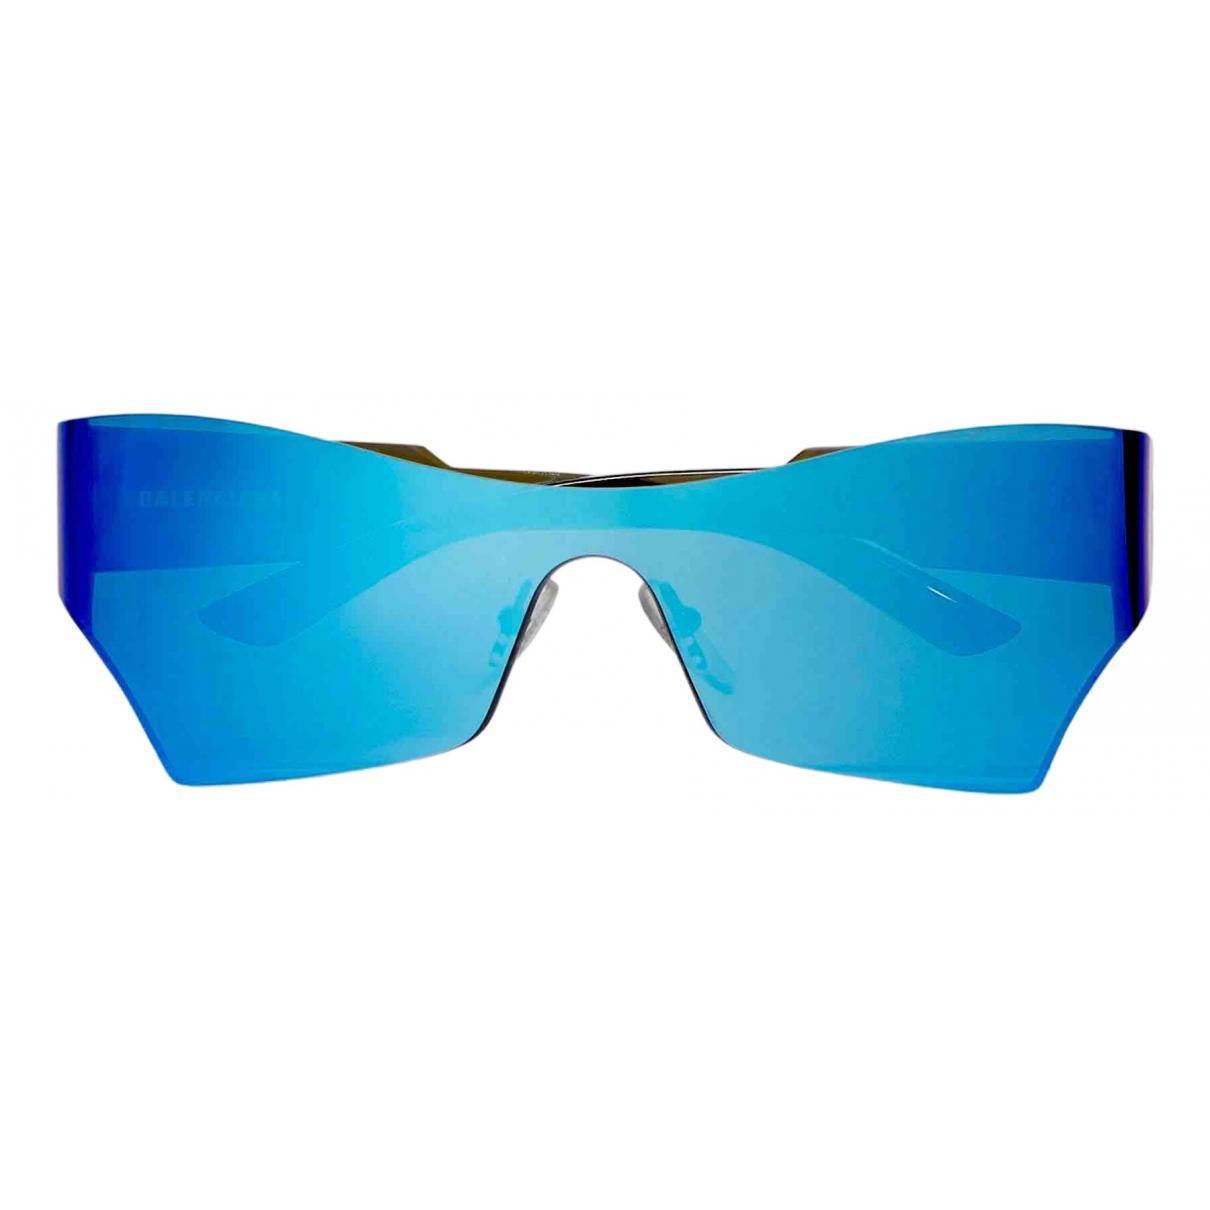 Balenciaga - Lunettes   pour homme - bleu